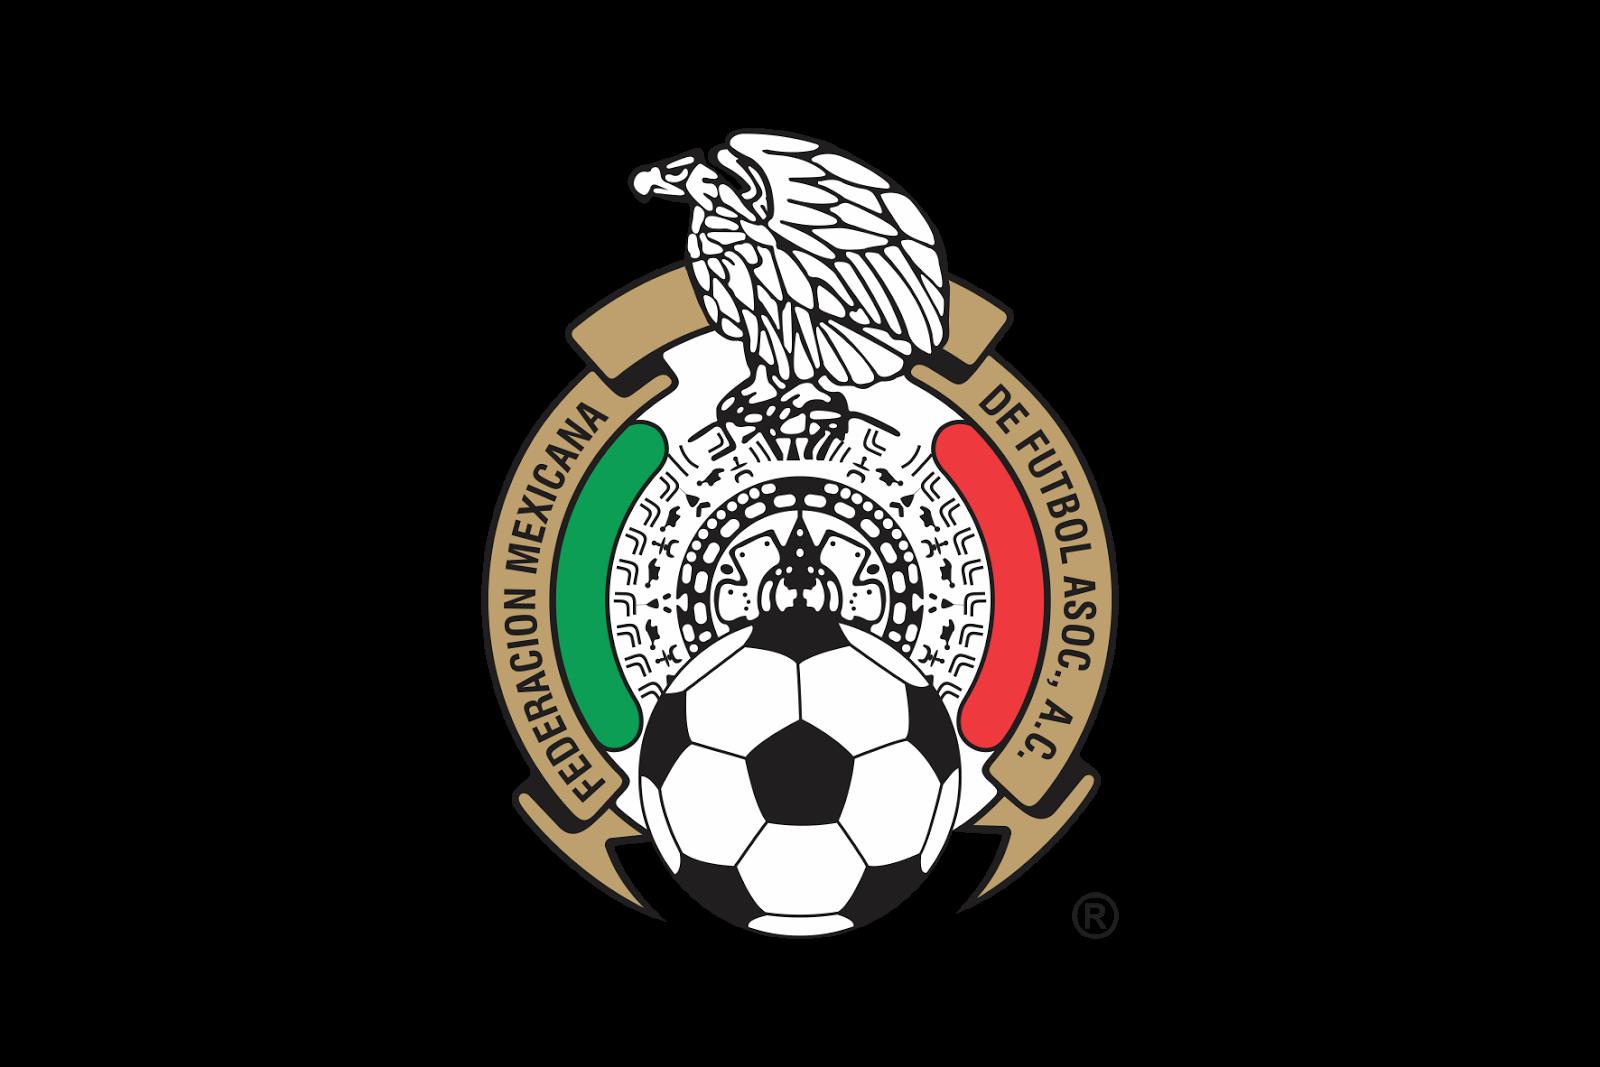 mexican federation of association football logo logoshare